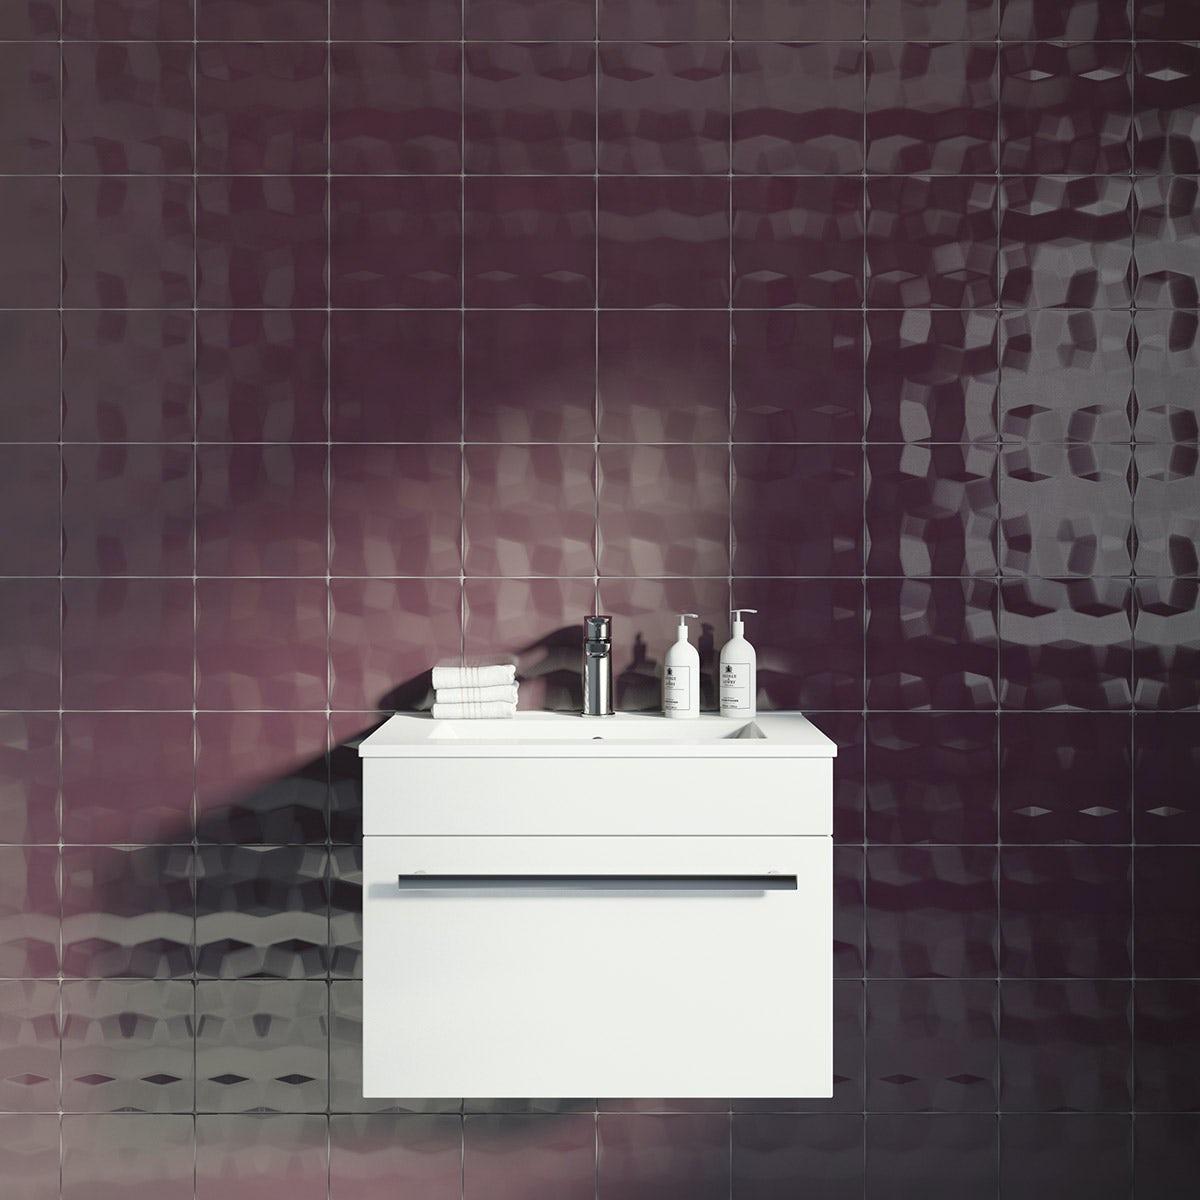 Studio Conran facet plum gloss tile 198mm x198mm